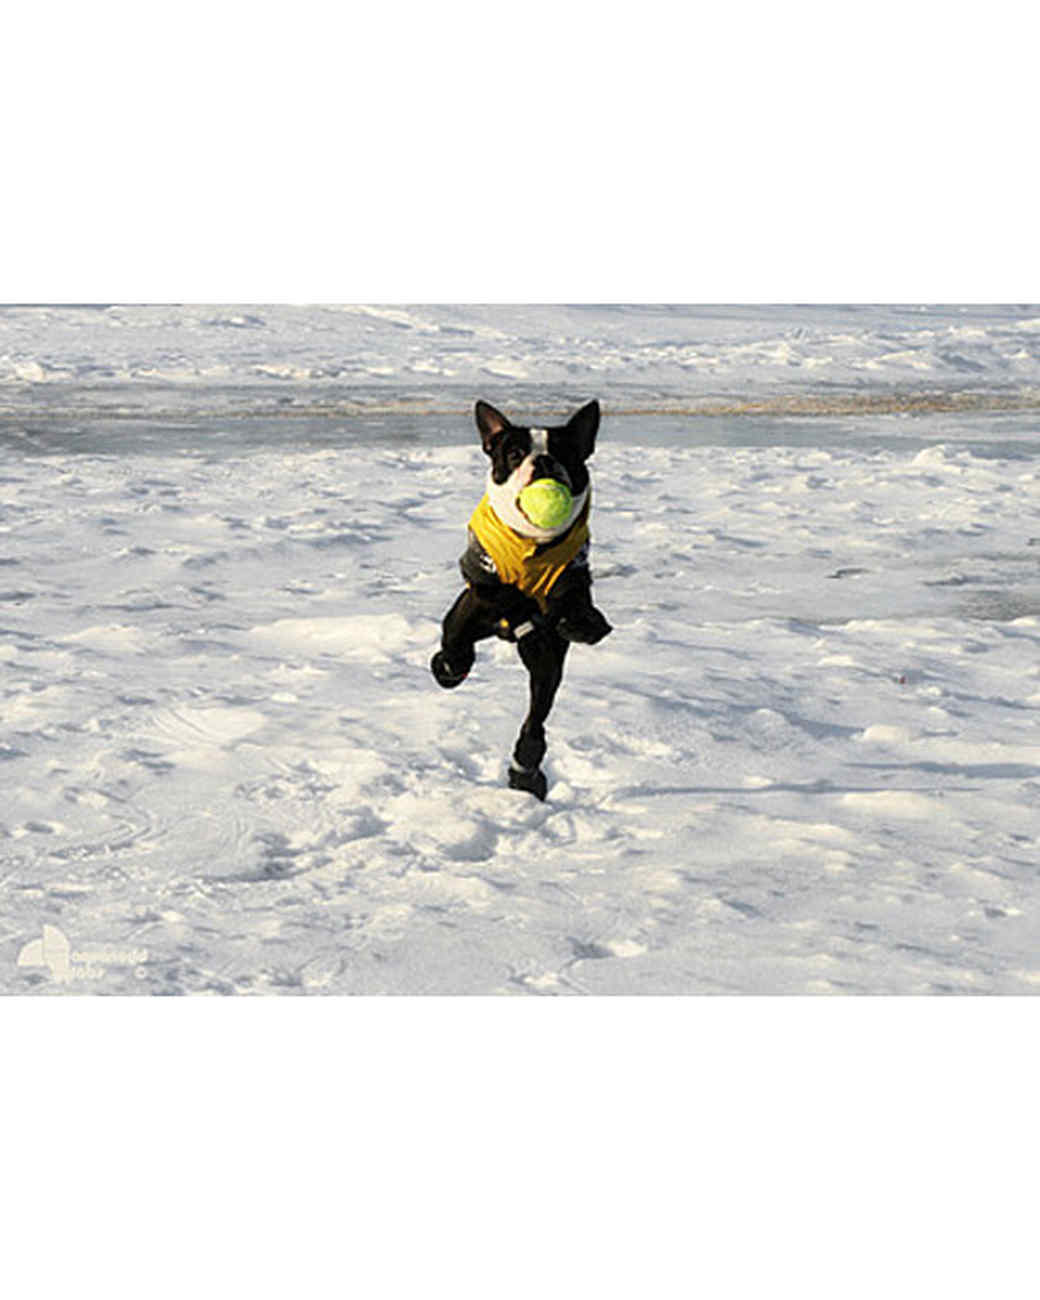 pets_snowangels_7205691_122717_19075669.jpg